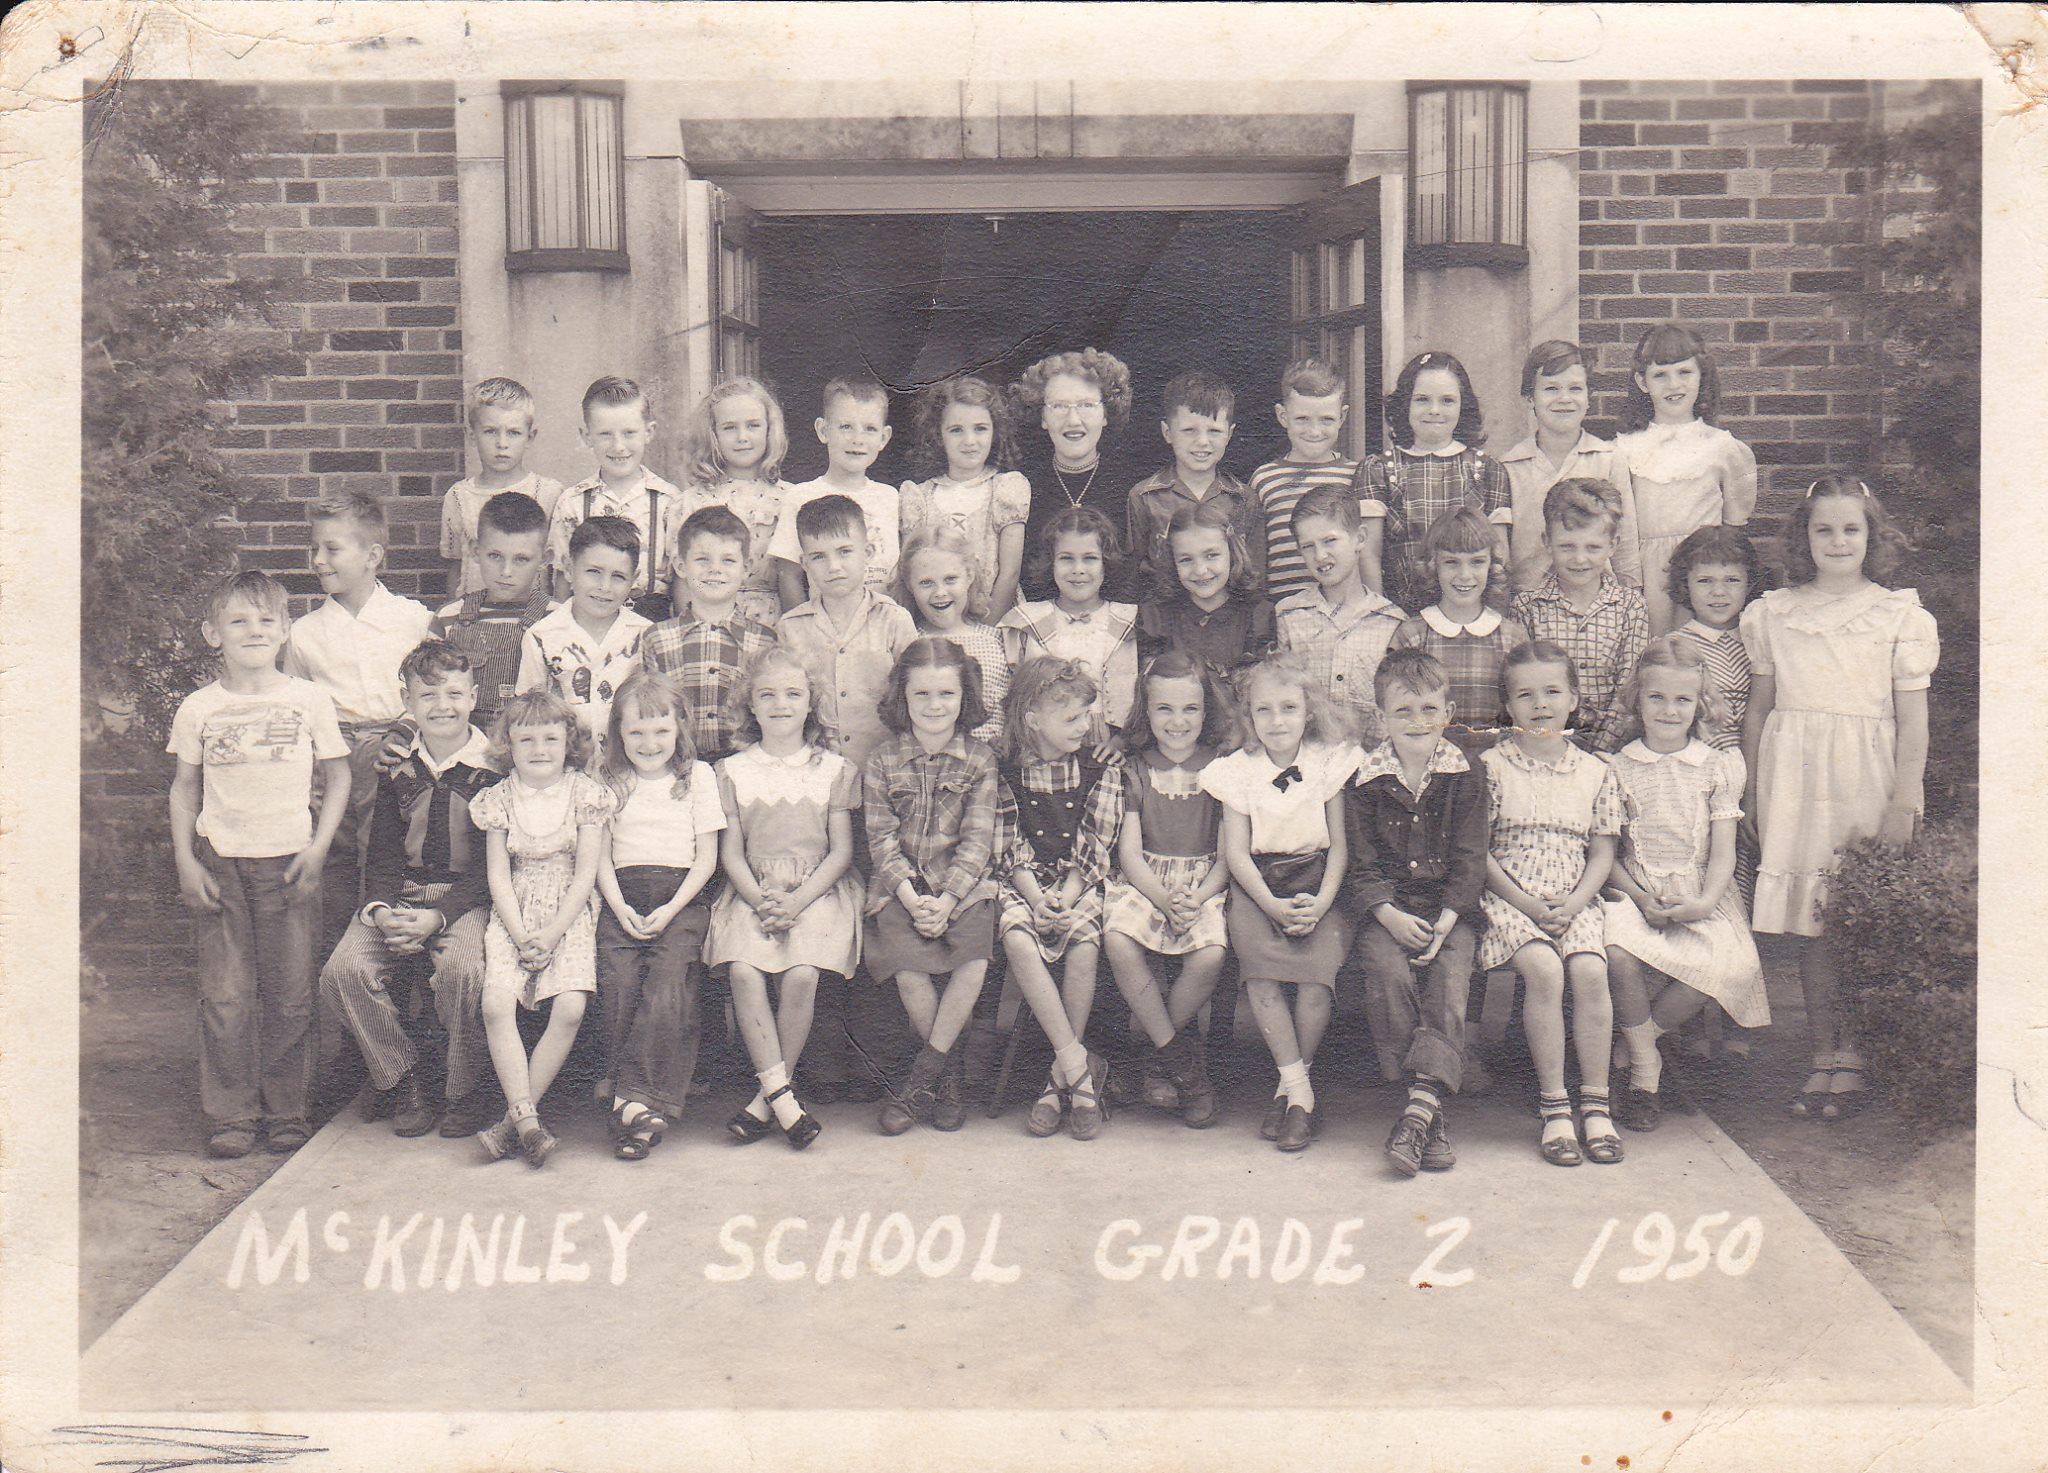 #105 P4 McKINLEY GRADE 2 1950 PARSONS, KS